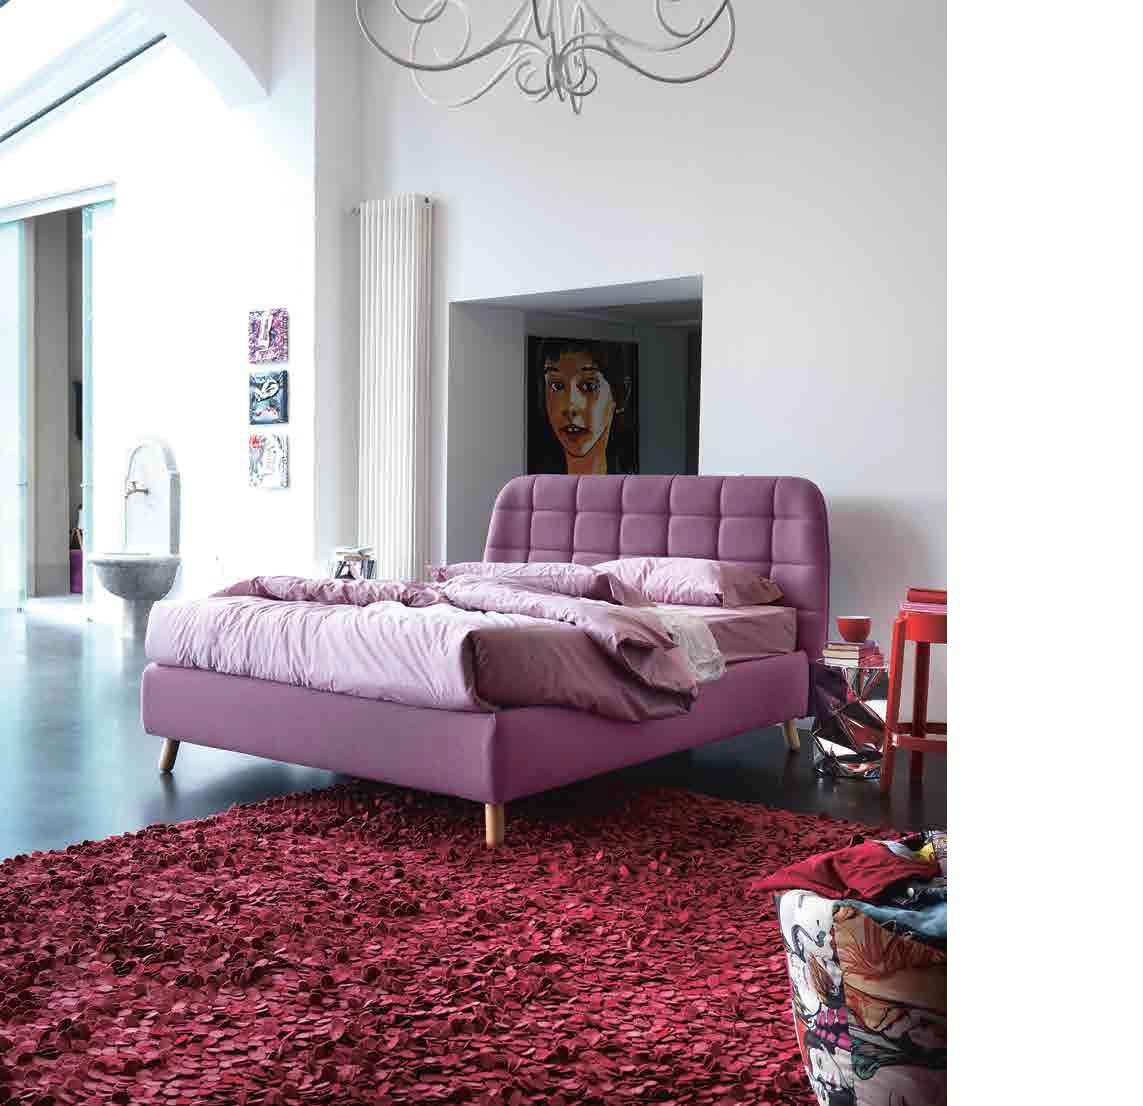 cabeceros-tapizados-general-muebles-paco-caballero-1811-5cdfdff39de83